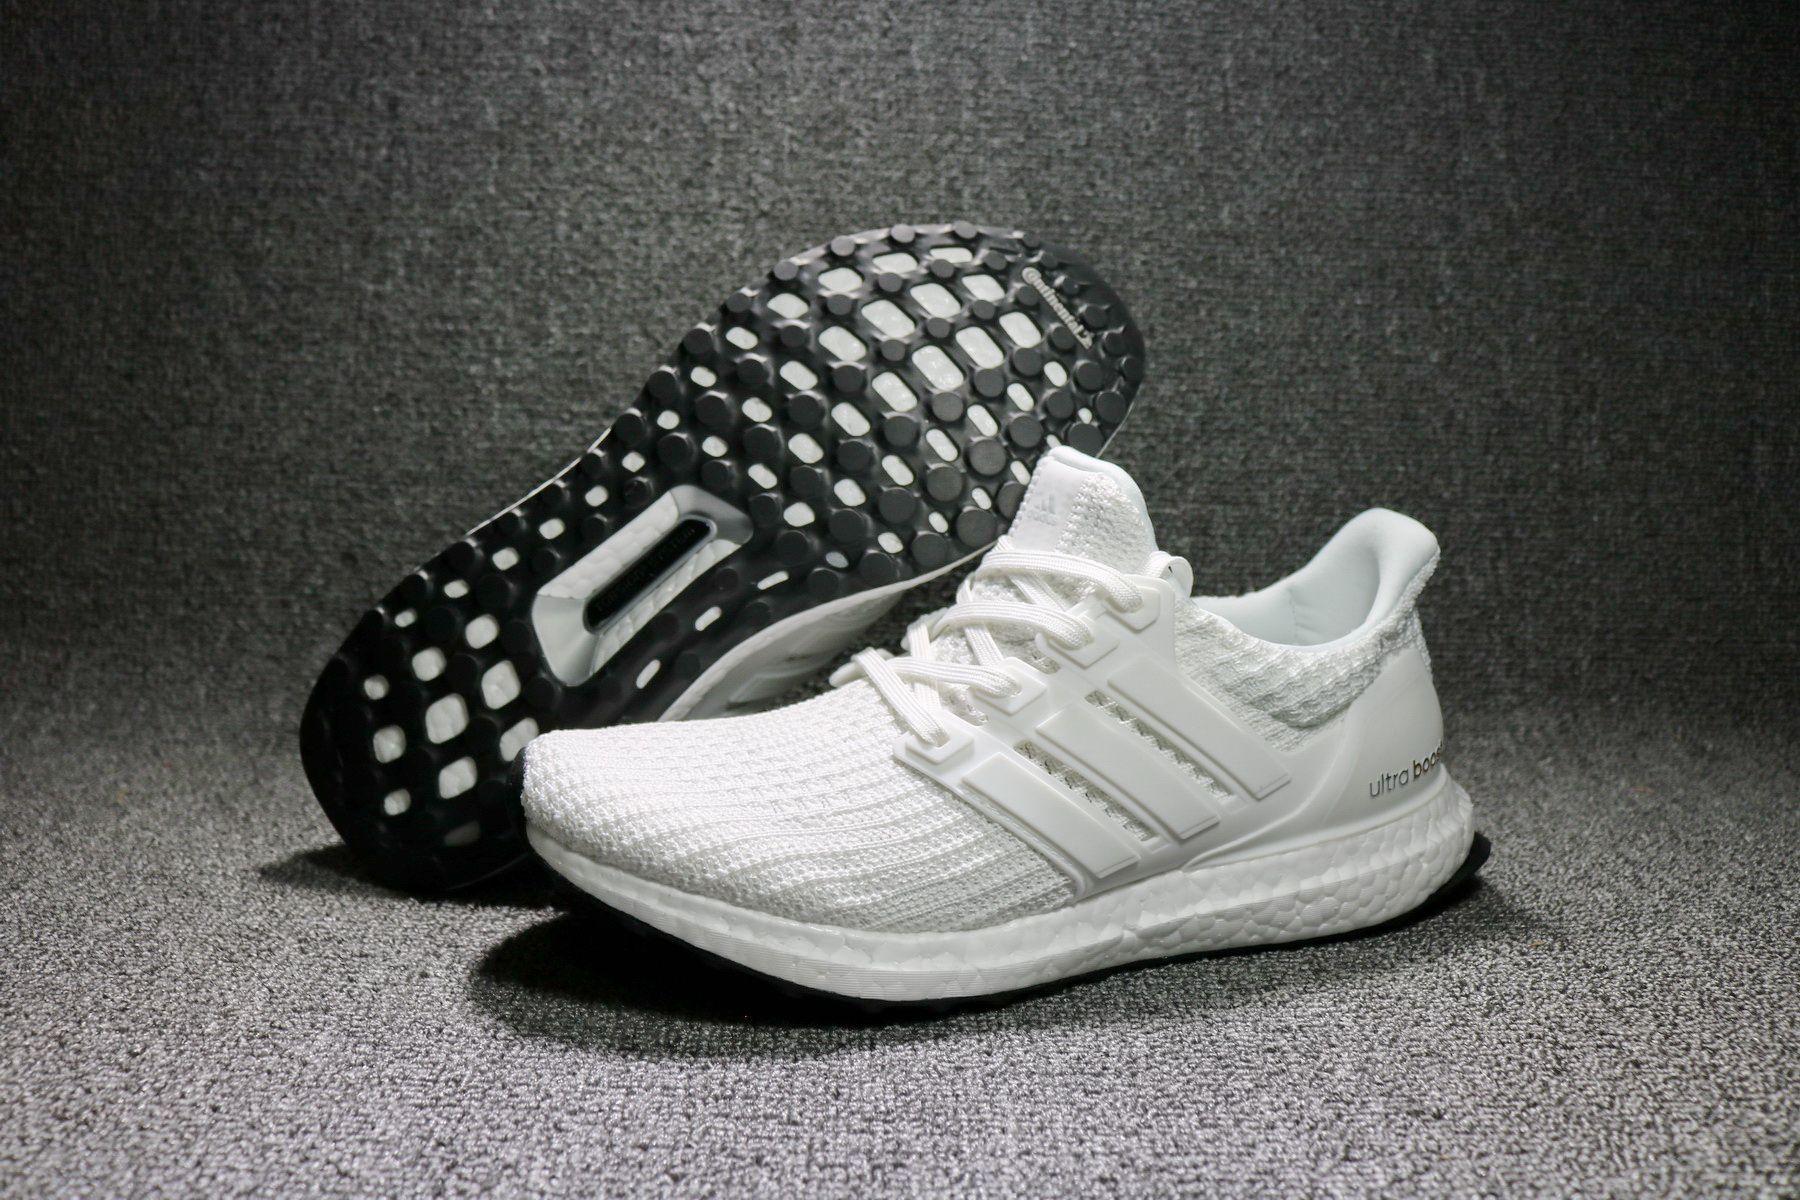 White Ultra Boost 4.0